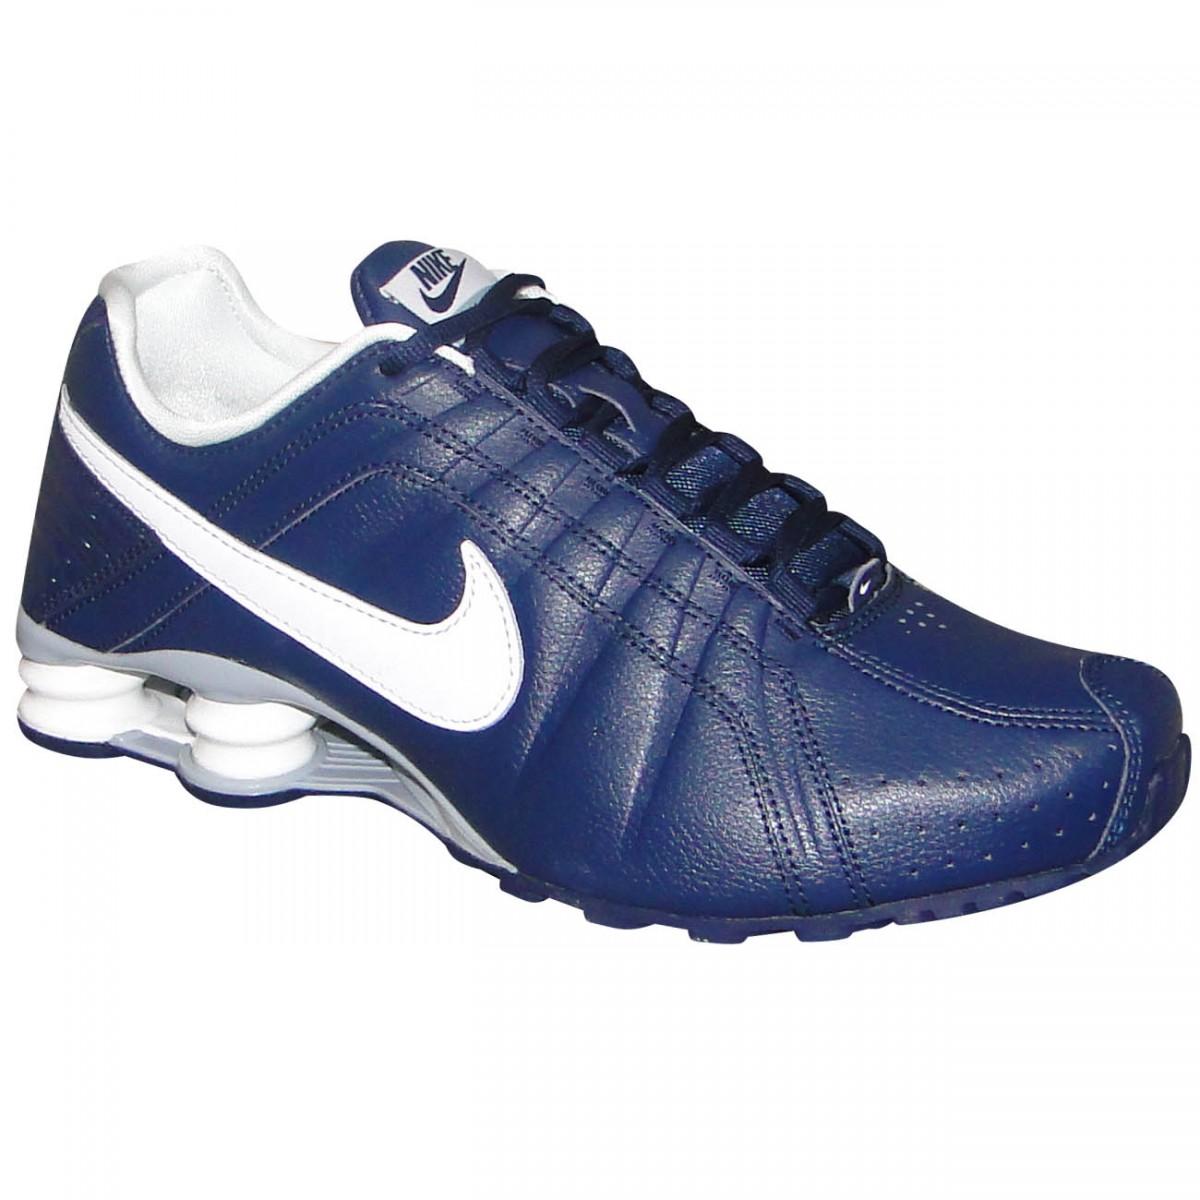 Tenis Nike Shox Junior 454340 402 - Marinho Branco - Chuteira Nike ... e450d3c17881c